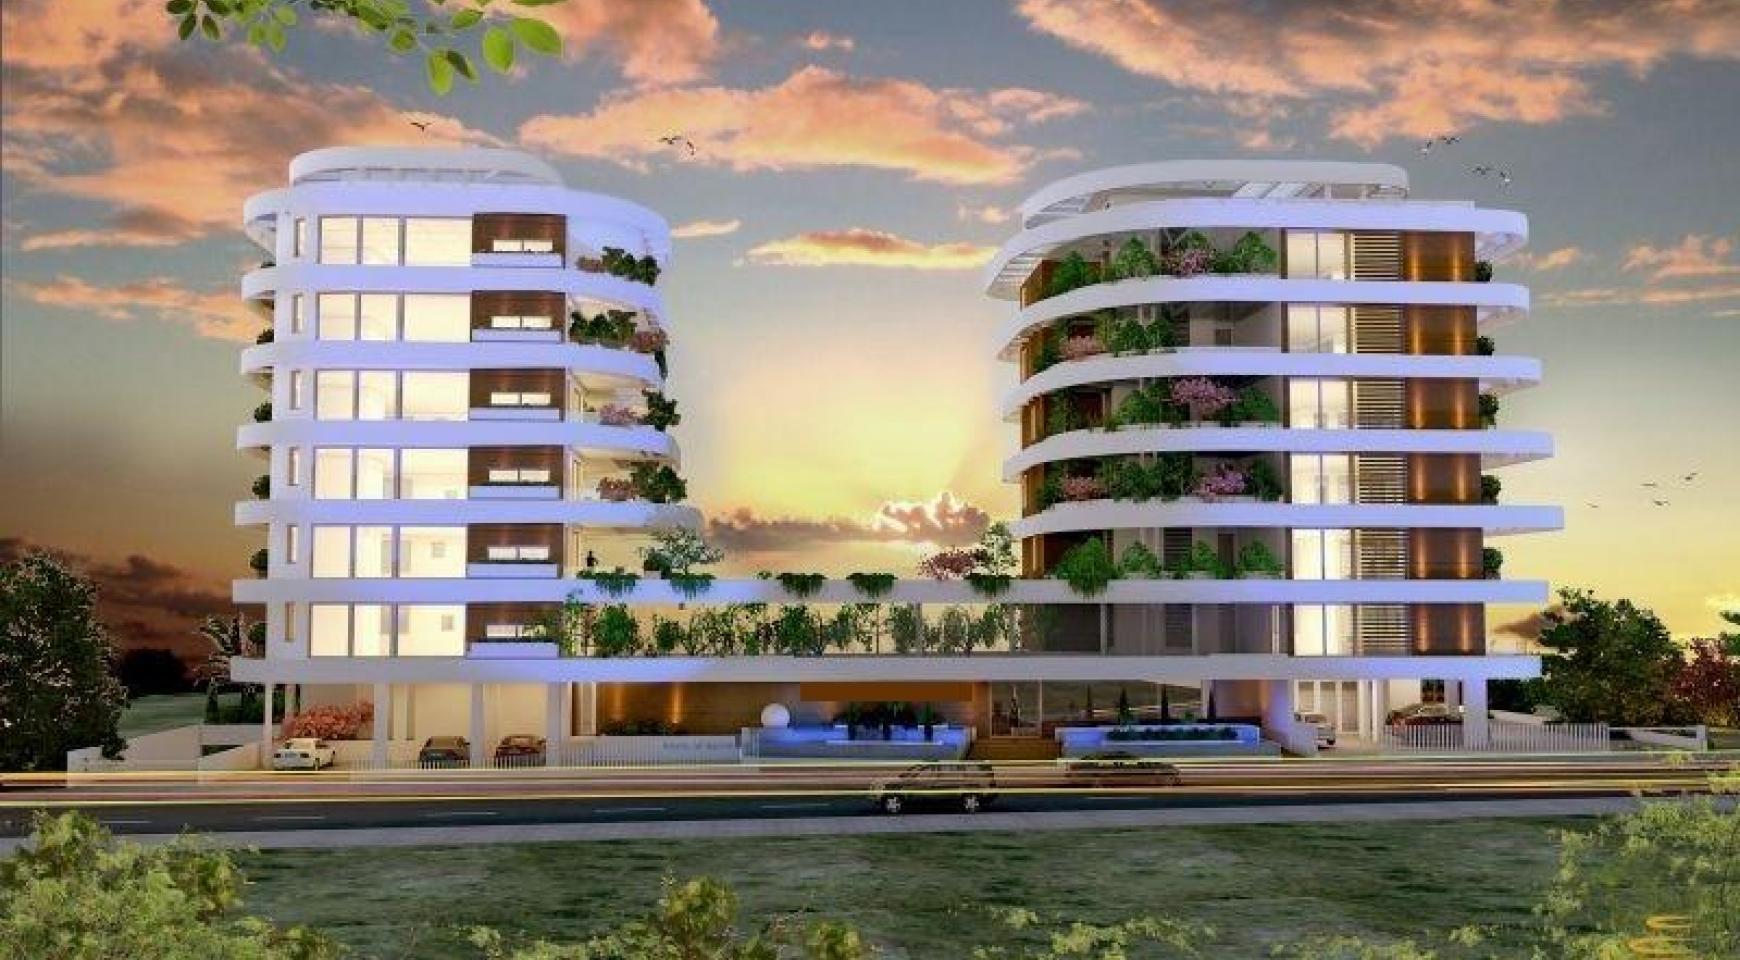 New 3 Bedroom Apartment near the Sea - 3